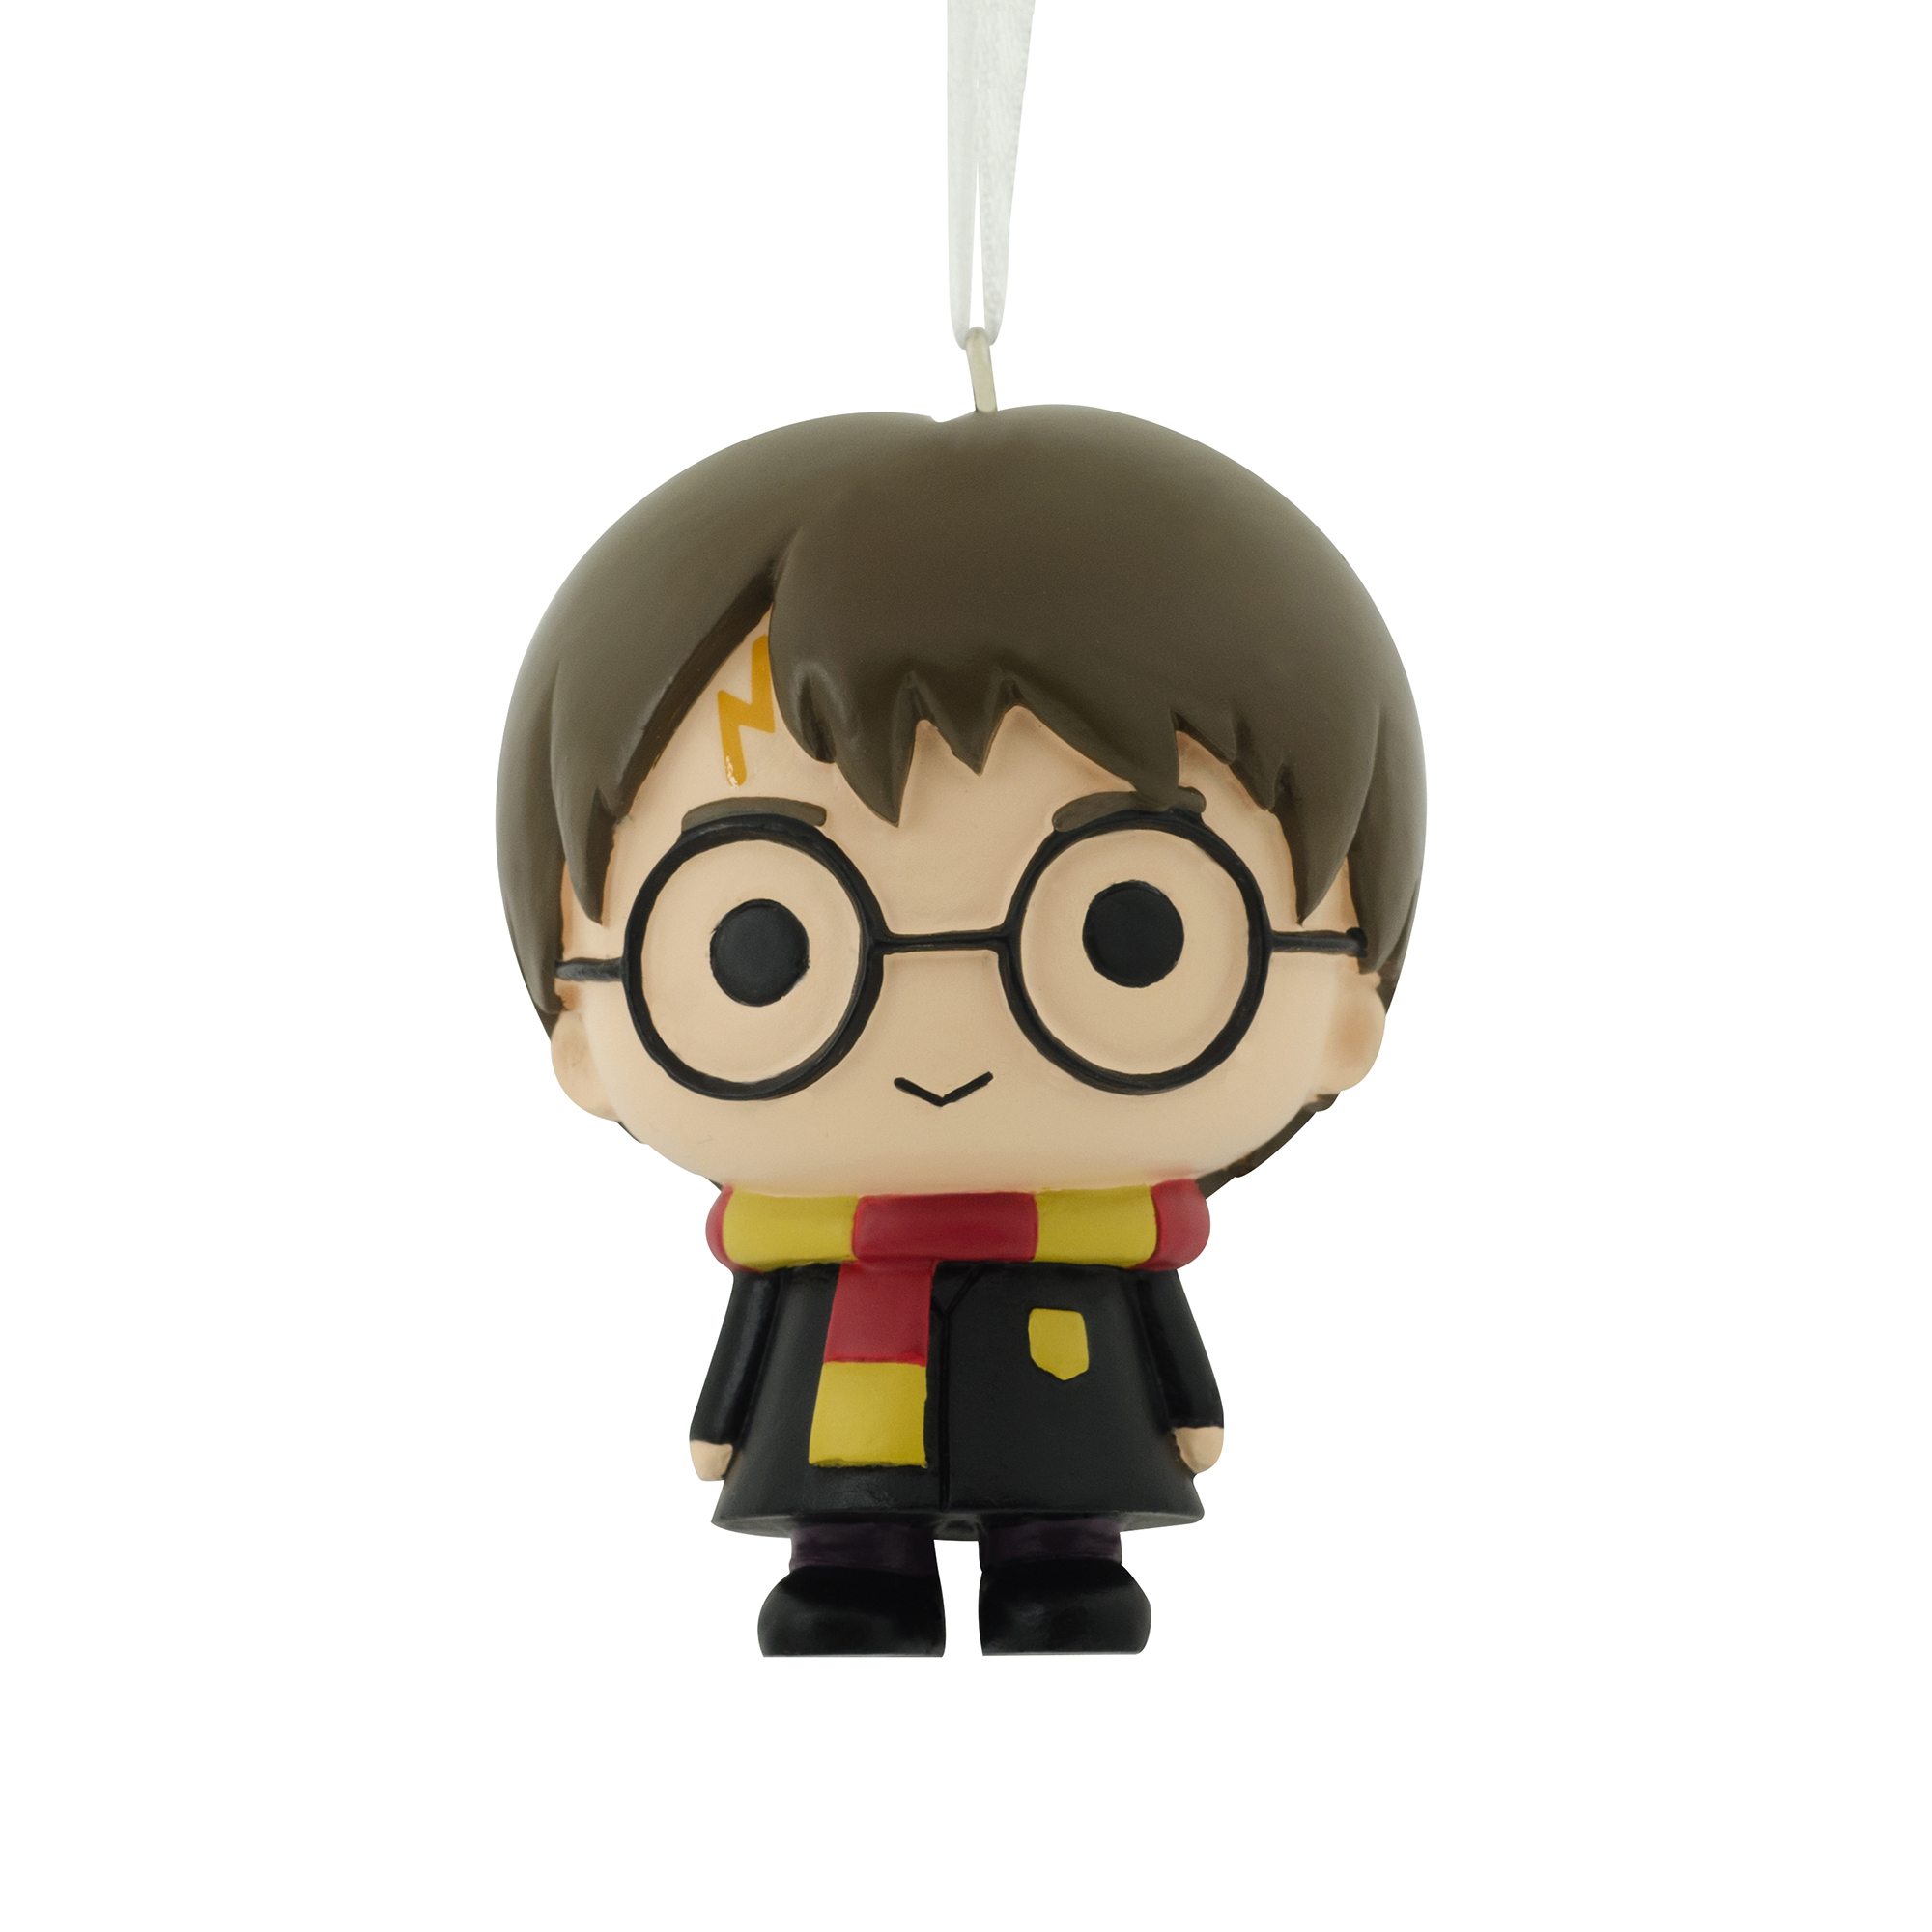 Hallmark Harry Potter Christmas Ornament